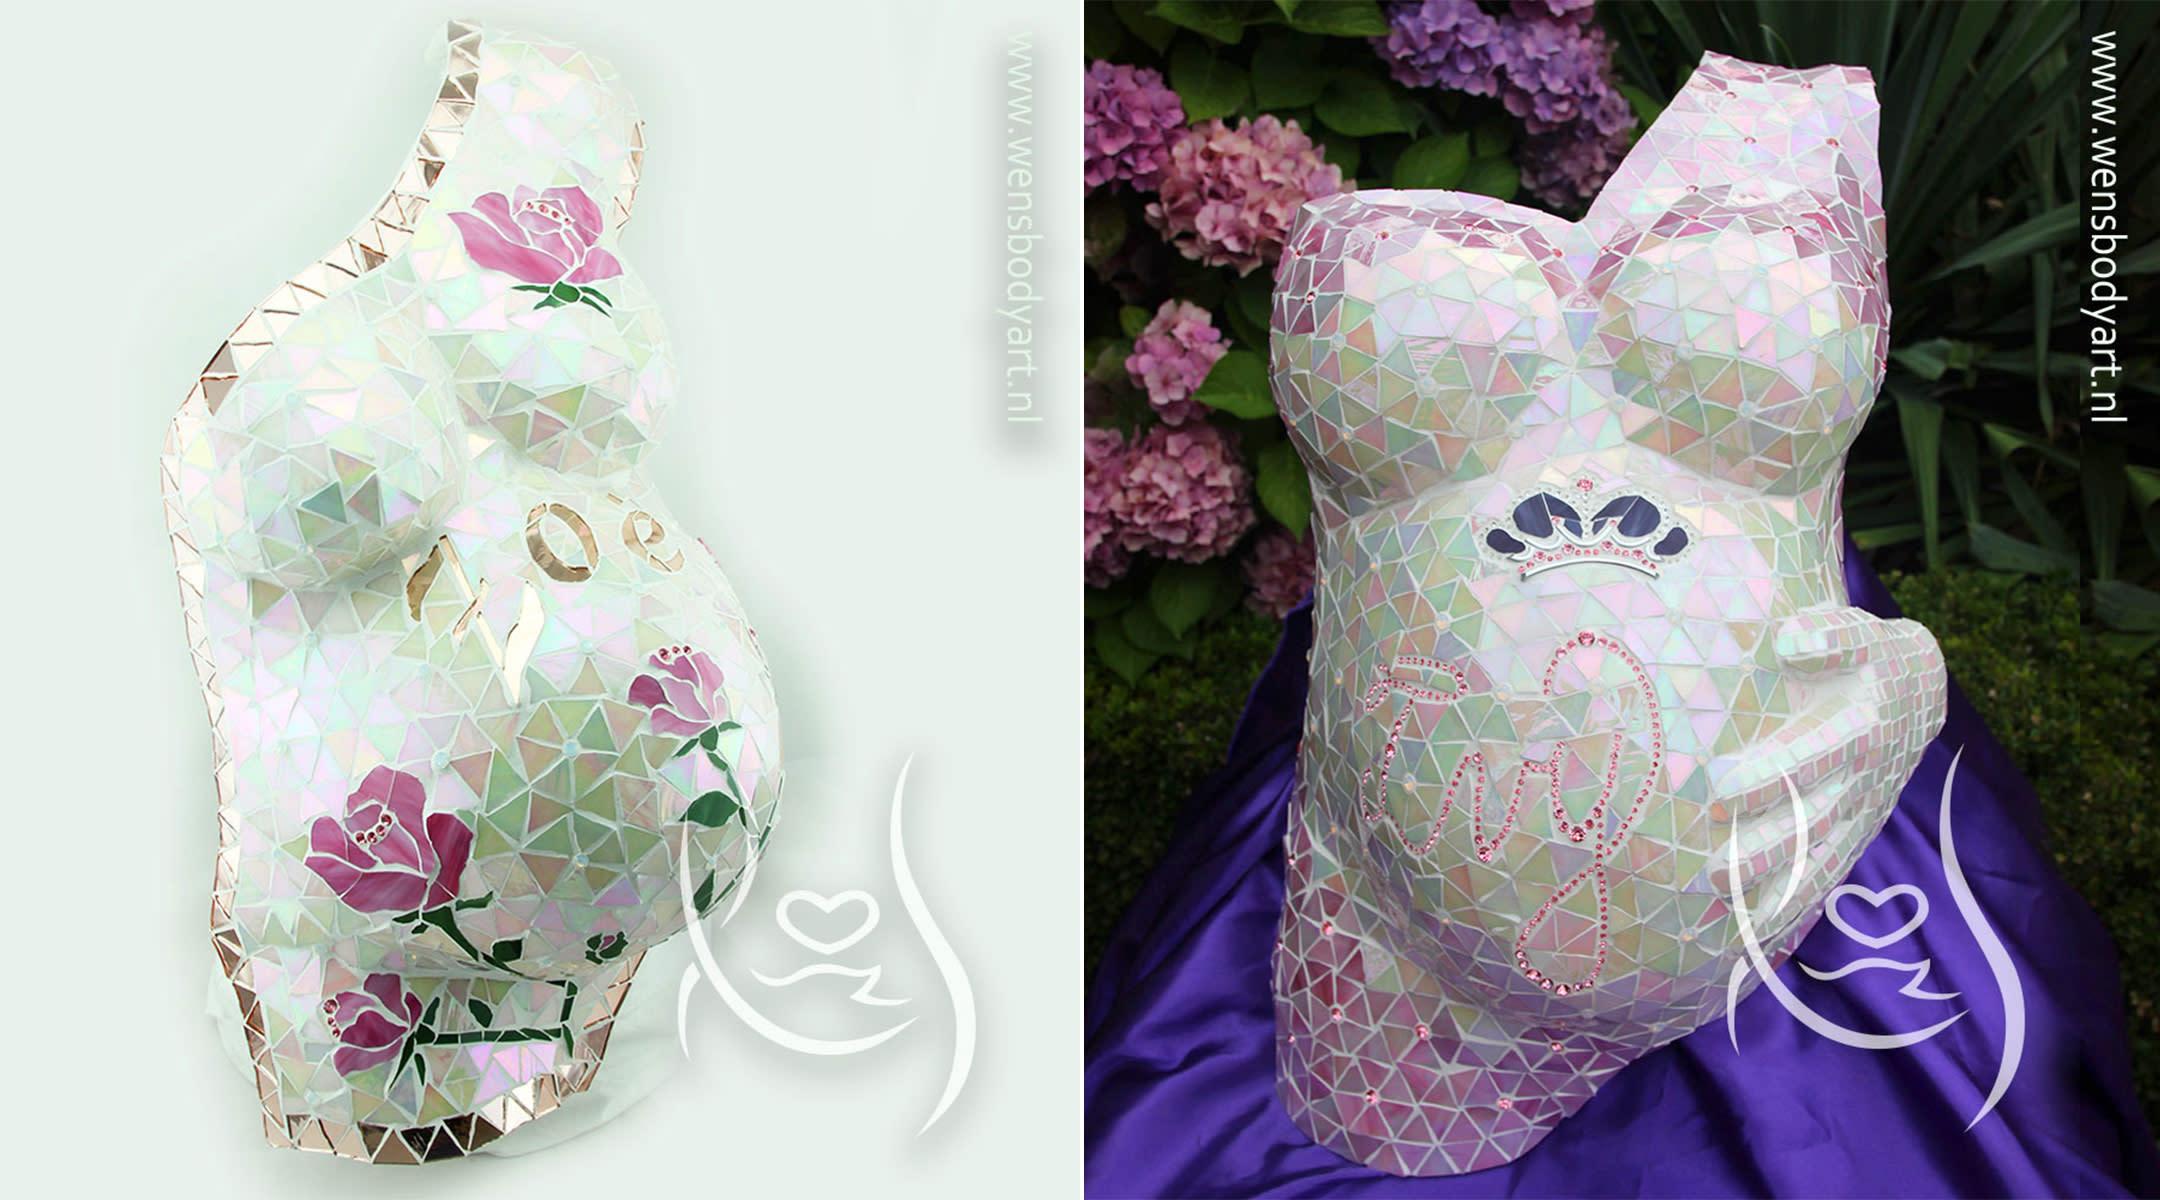 artist creates mosaic body casts for pregnant women